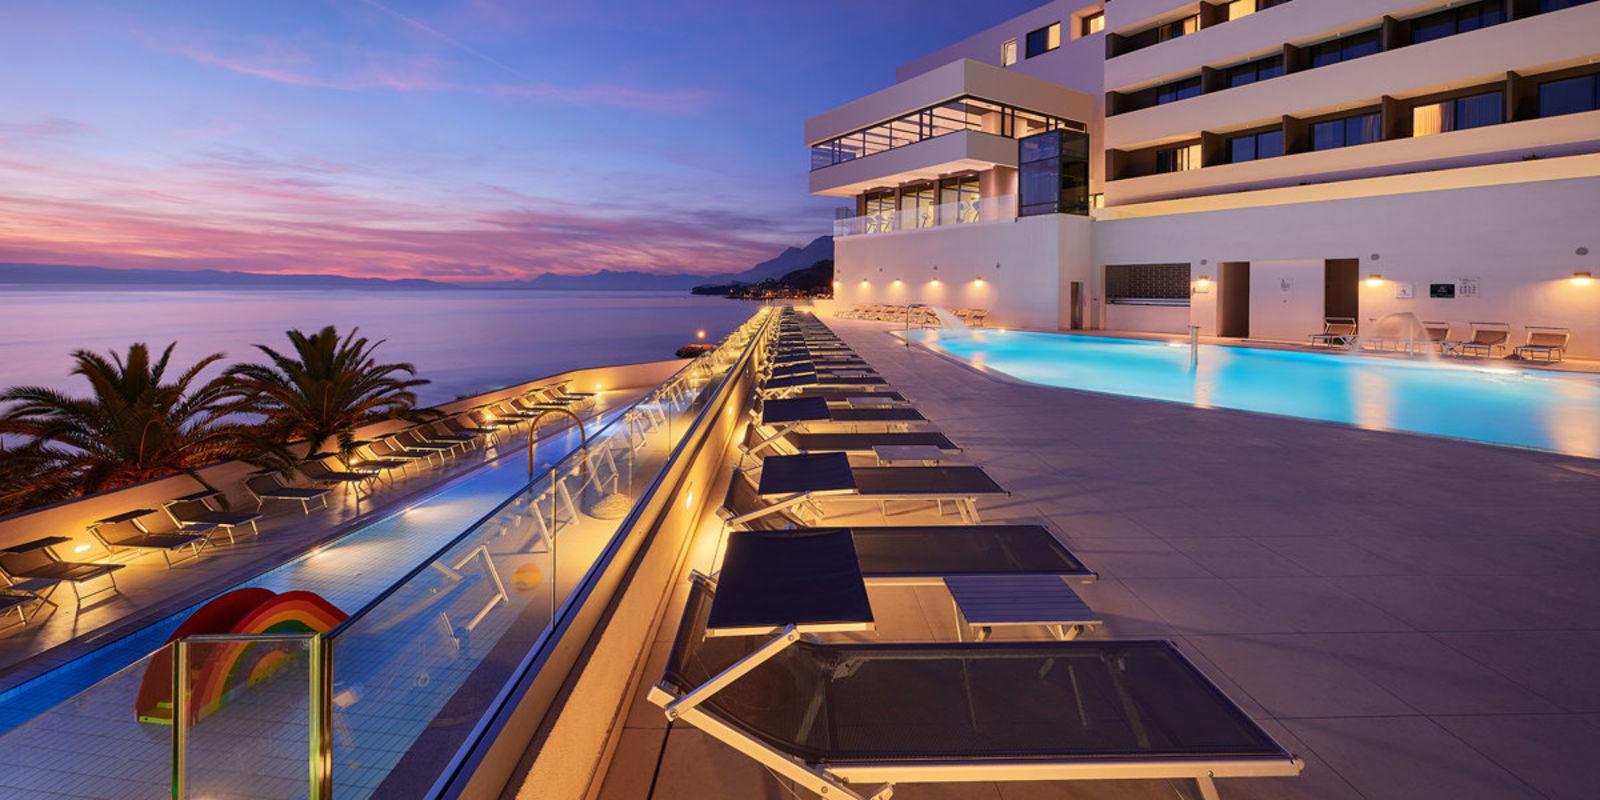 Impressions and Other Assets/triverna_Podgora_Chorwacja_Medora_Auri_Family_Beach_Resort_croatia_main_wbtndy